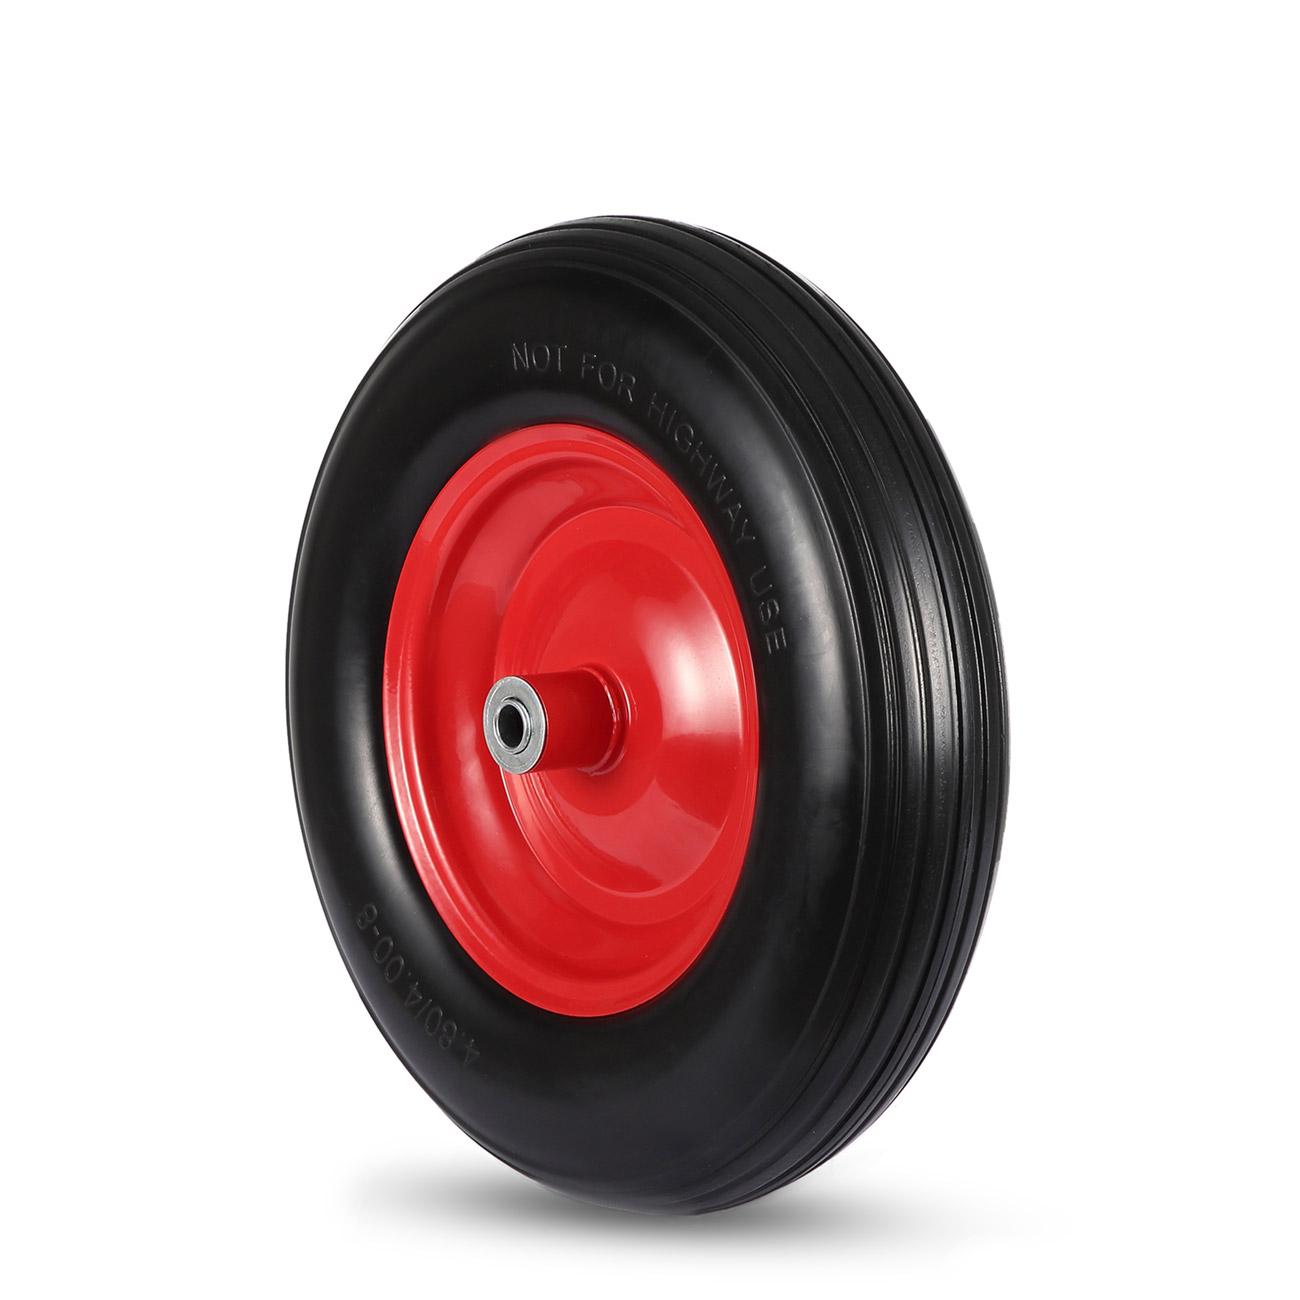 maxcraft roue de brouette pu avec axe noir rouge. Black Bedroom Furniture Sets. Home Design Ideas